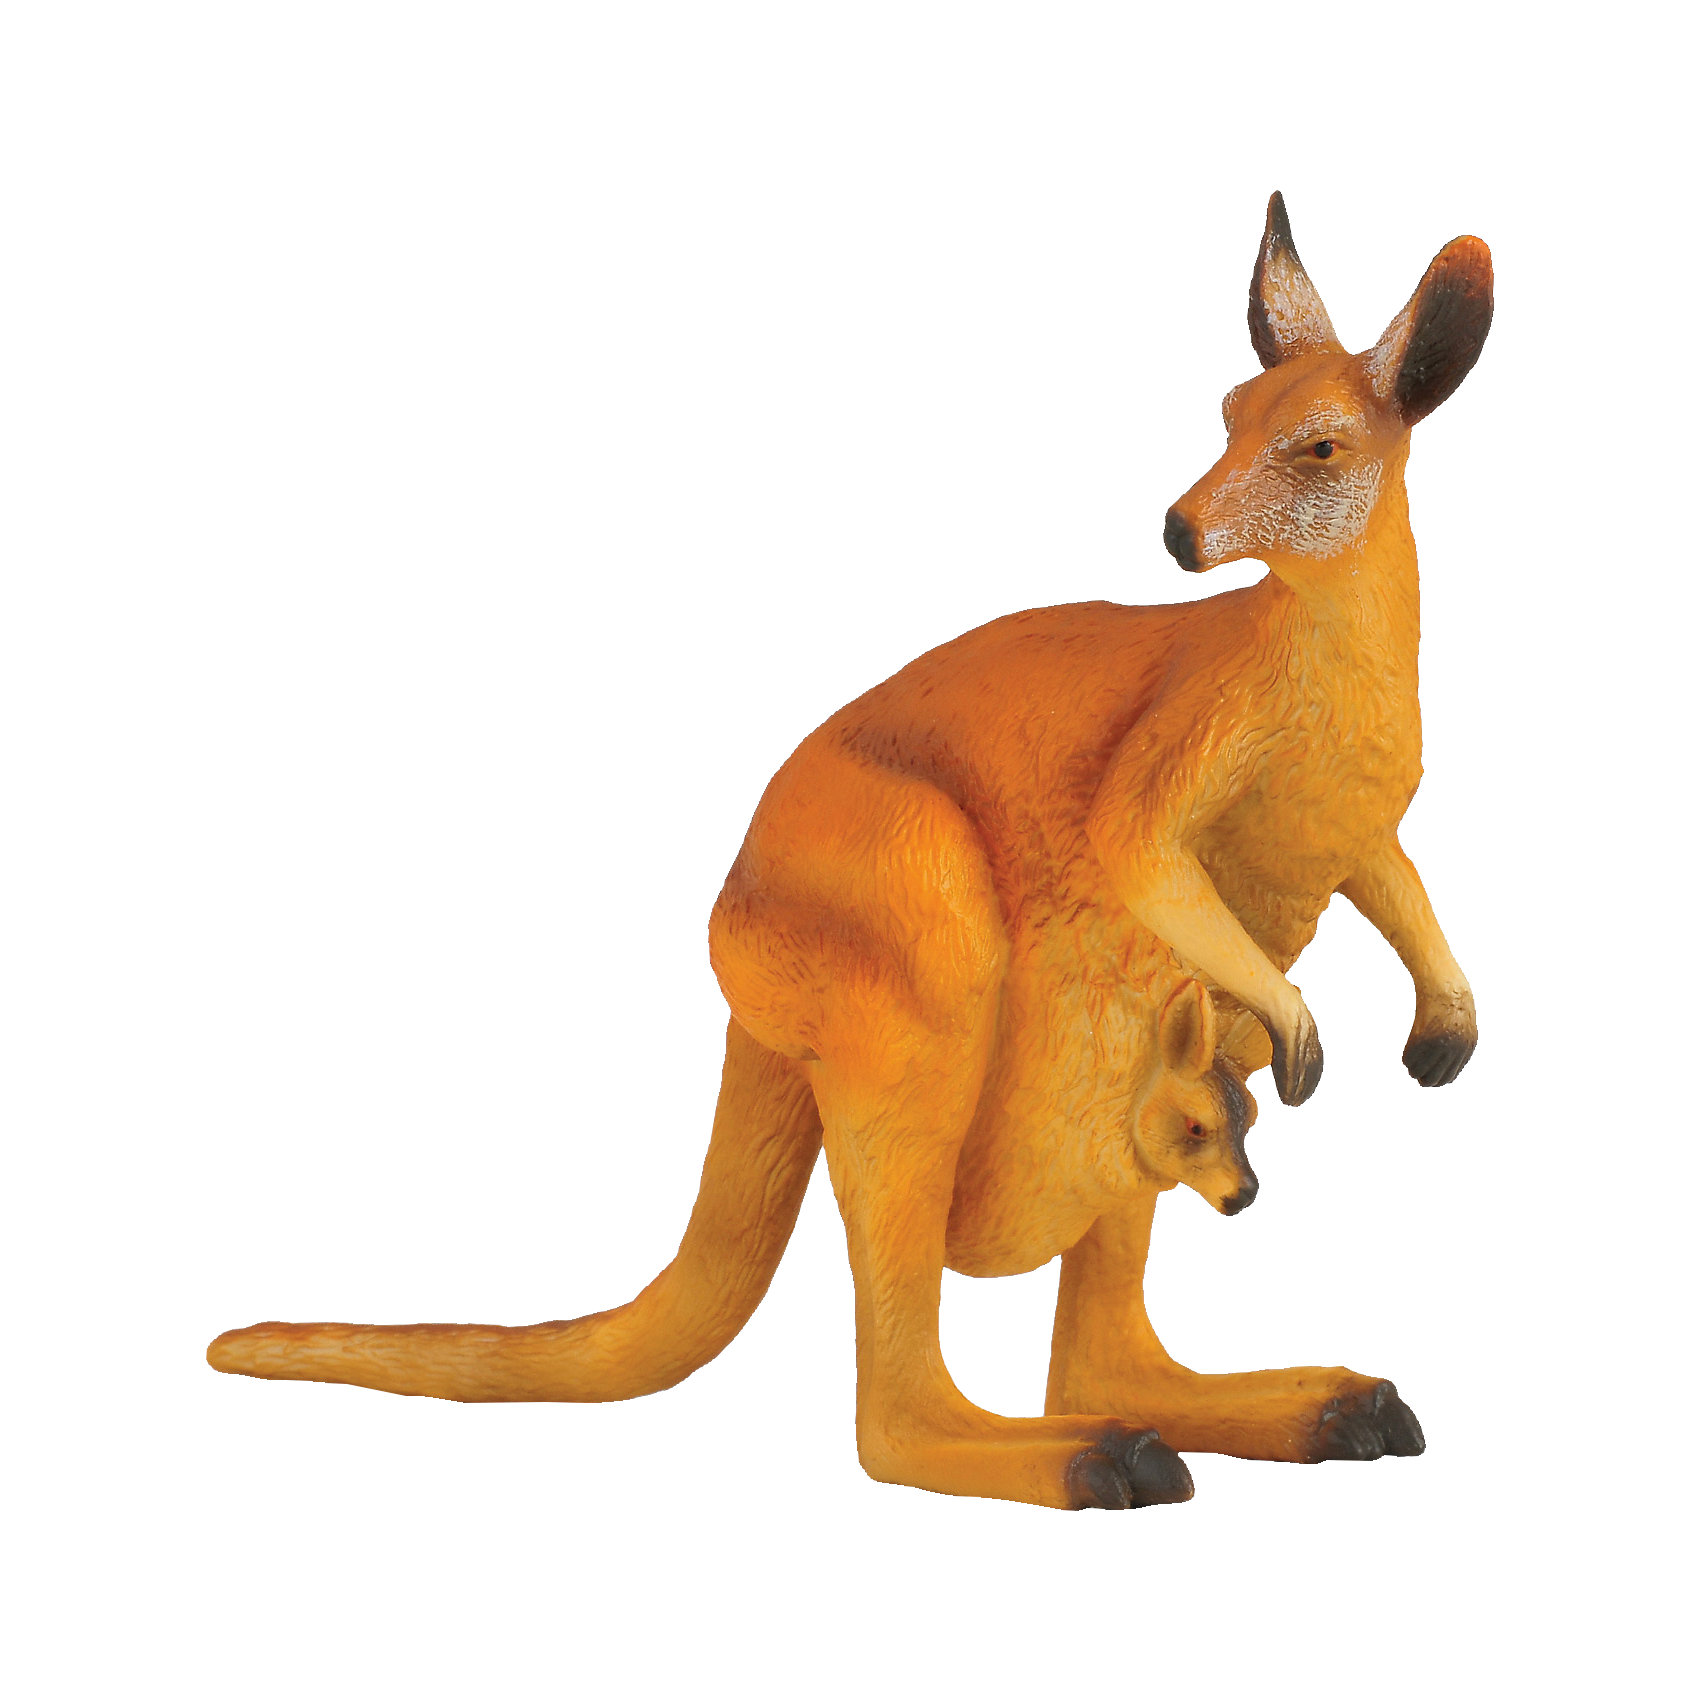 Красный кенгуру (L), CollectaМир животных<br><br><br>Ширина мм: 200<br>Глубина мм: 10<br>Высота мм: 10<br>Вес г: 84<br>Возраст от месяцев: 36<br>Возраст до месяцев: 192<br>Пол: Унисекс<br>Возраст: Детский<br>SKU: 5534517